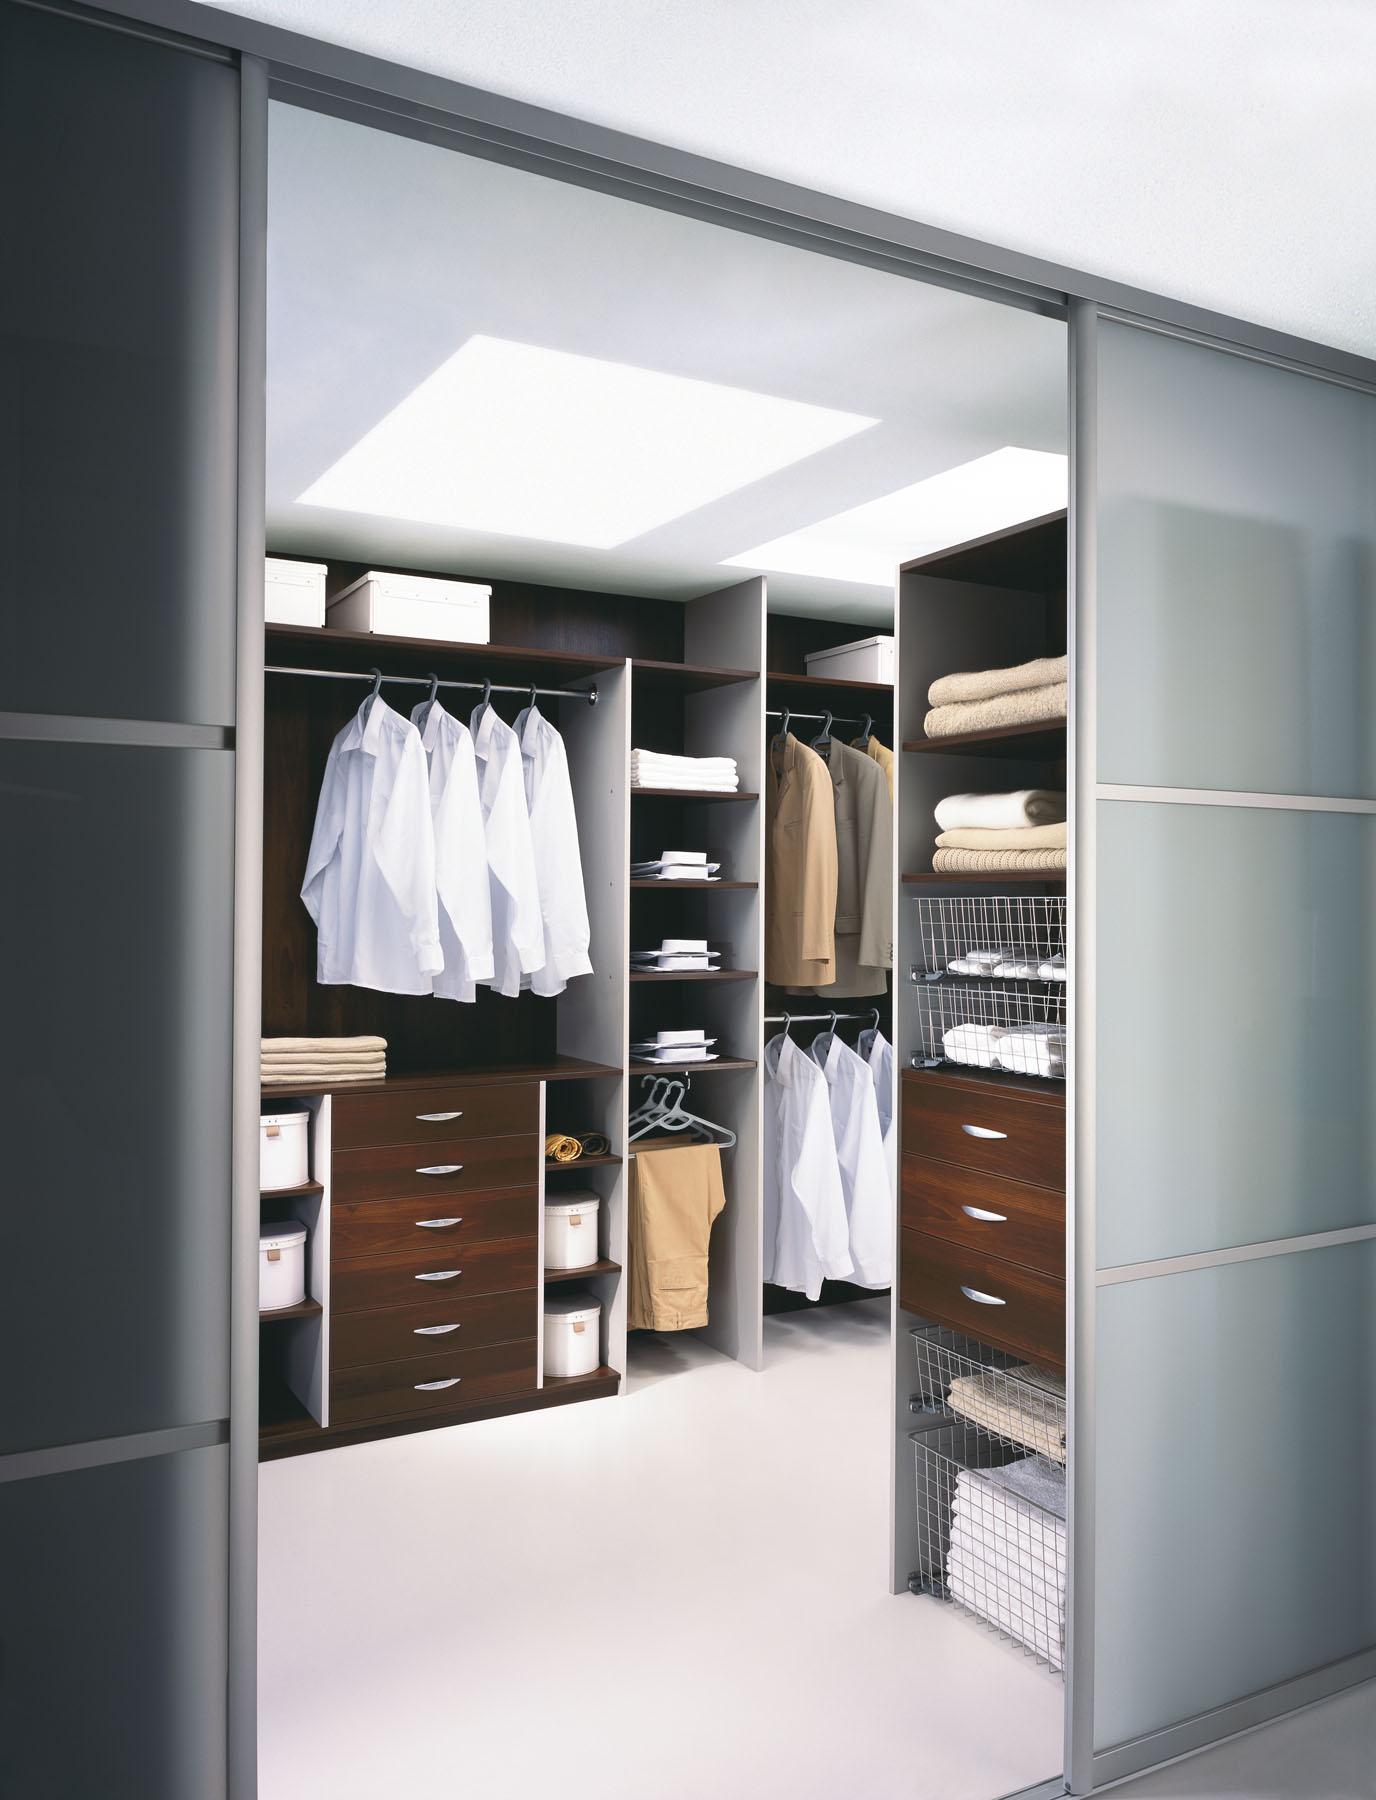 Шкафы купе для гардеробных комнат - komandor.